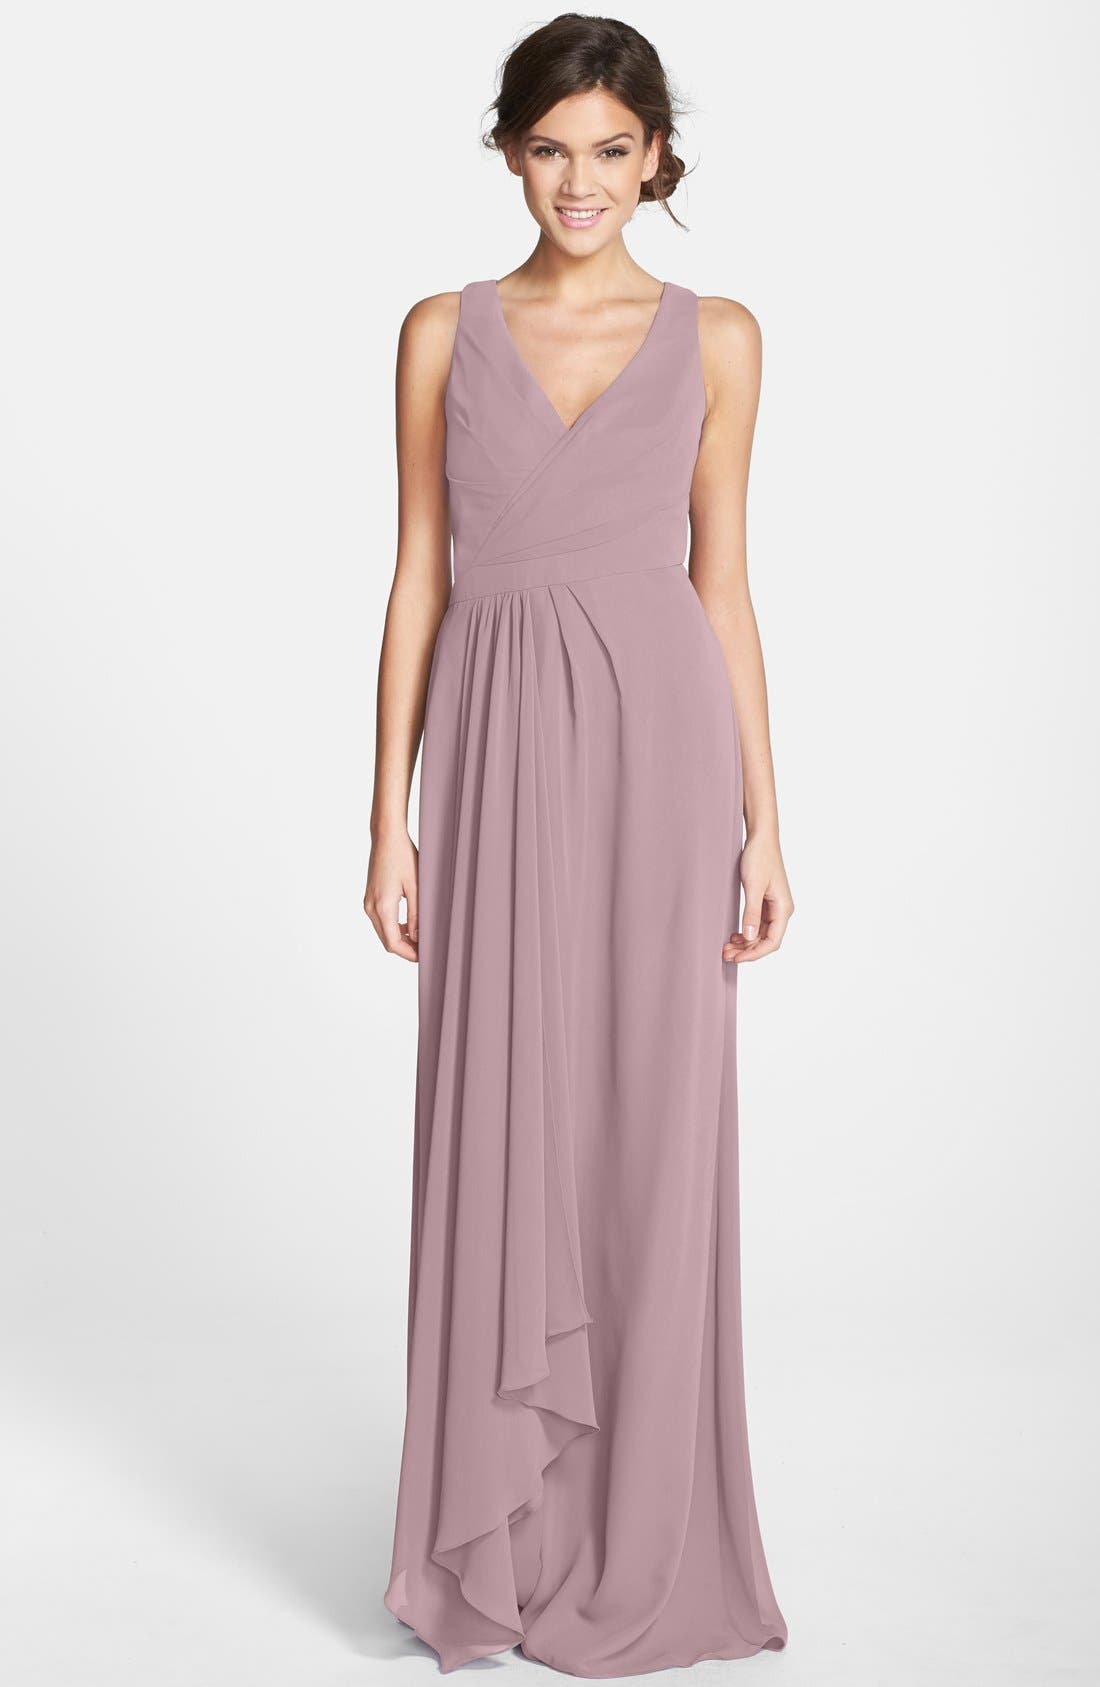 Monique Lhuillier Bridesmaids Sleeveless V-Neck Chiffon Gown (Nordstrom Exclusive)